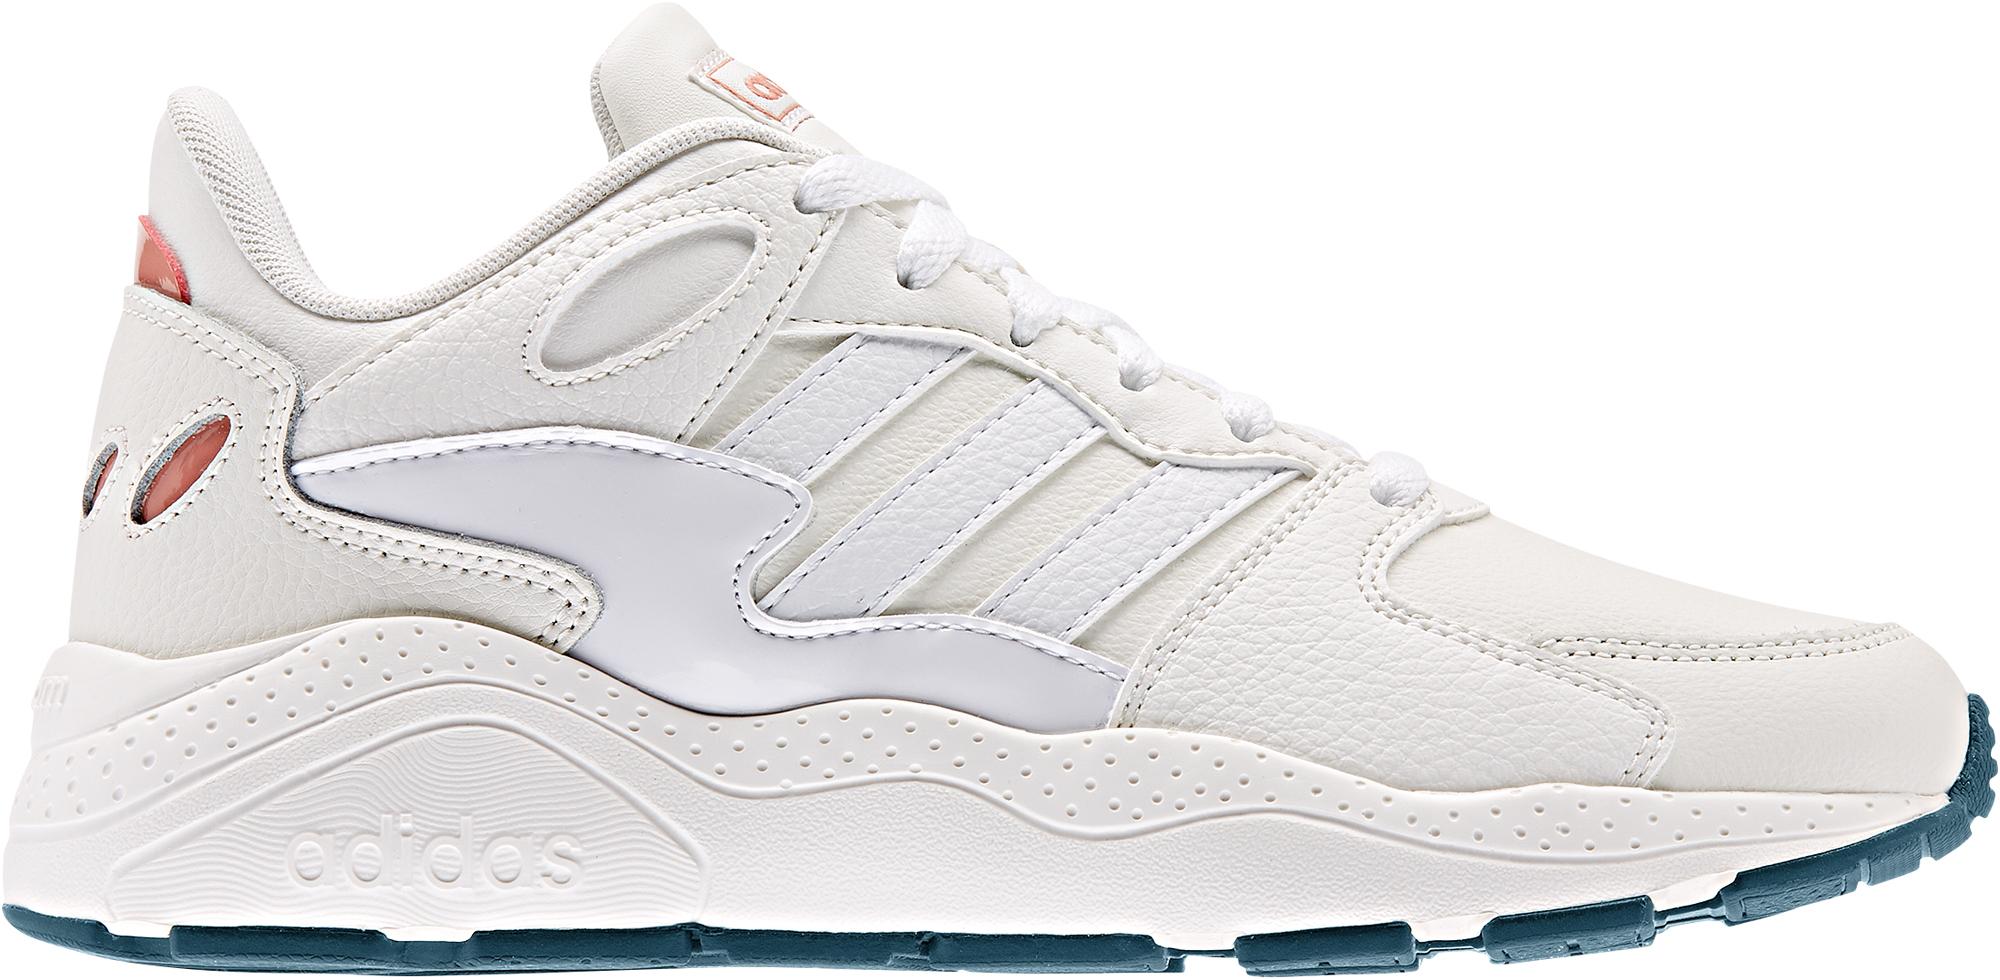 Adidas Кроссовки женские CHAOS, размер 37,5